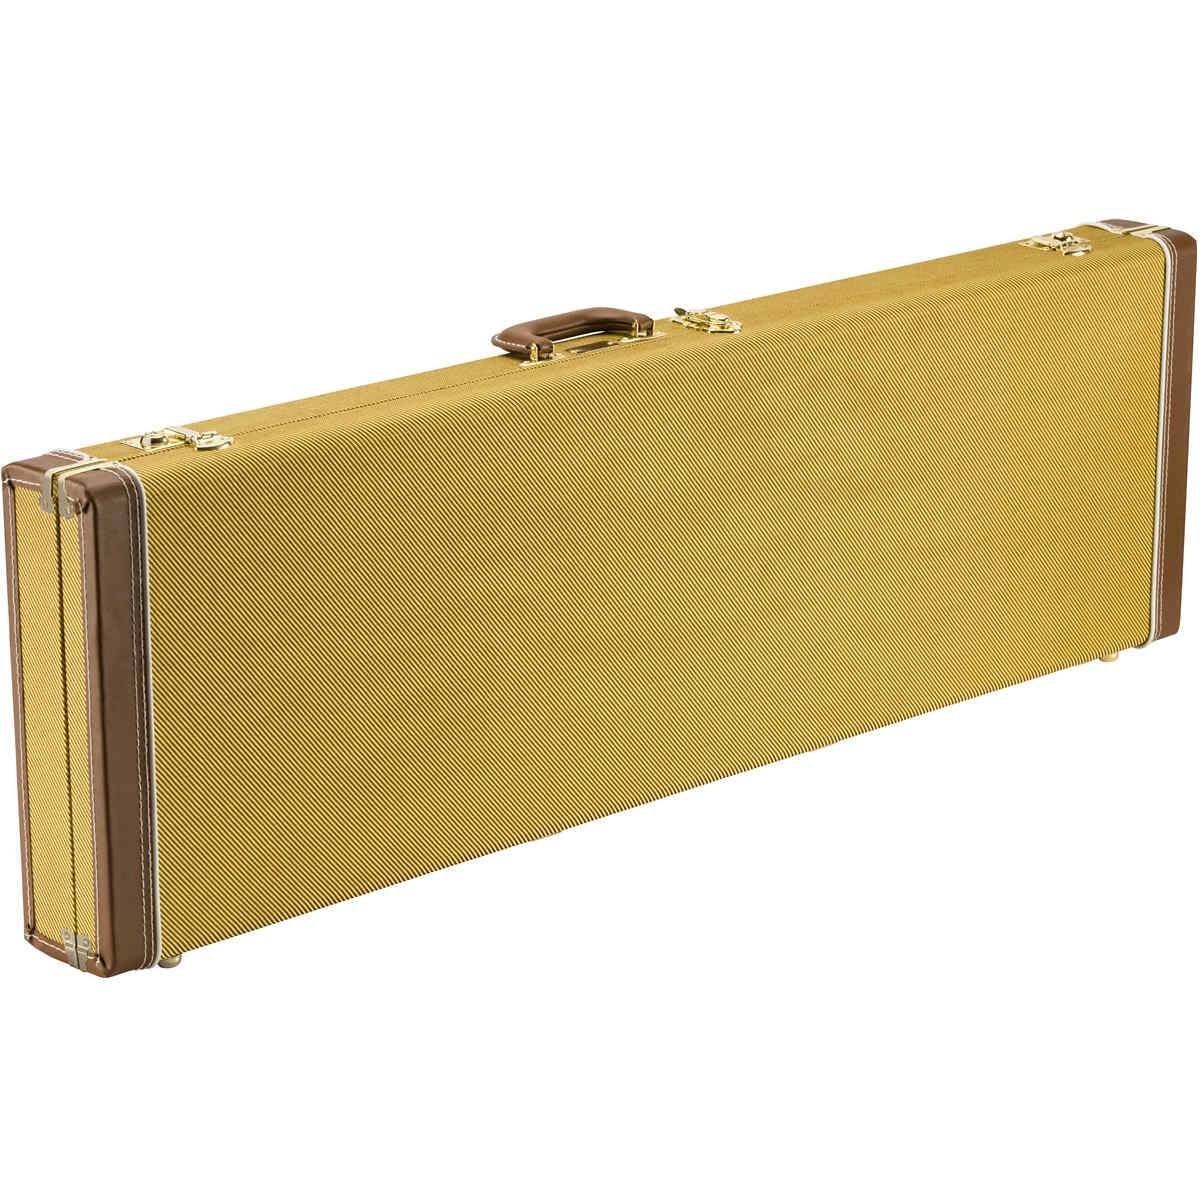 Fender Classic Series Case - Precision Bass®/Jazz Bass®, Tweed